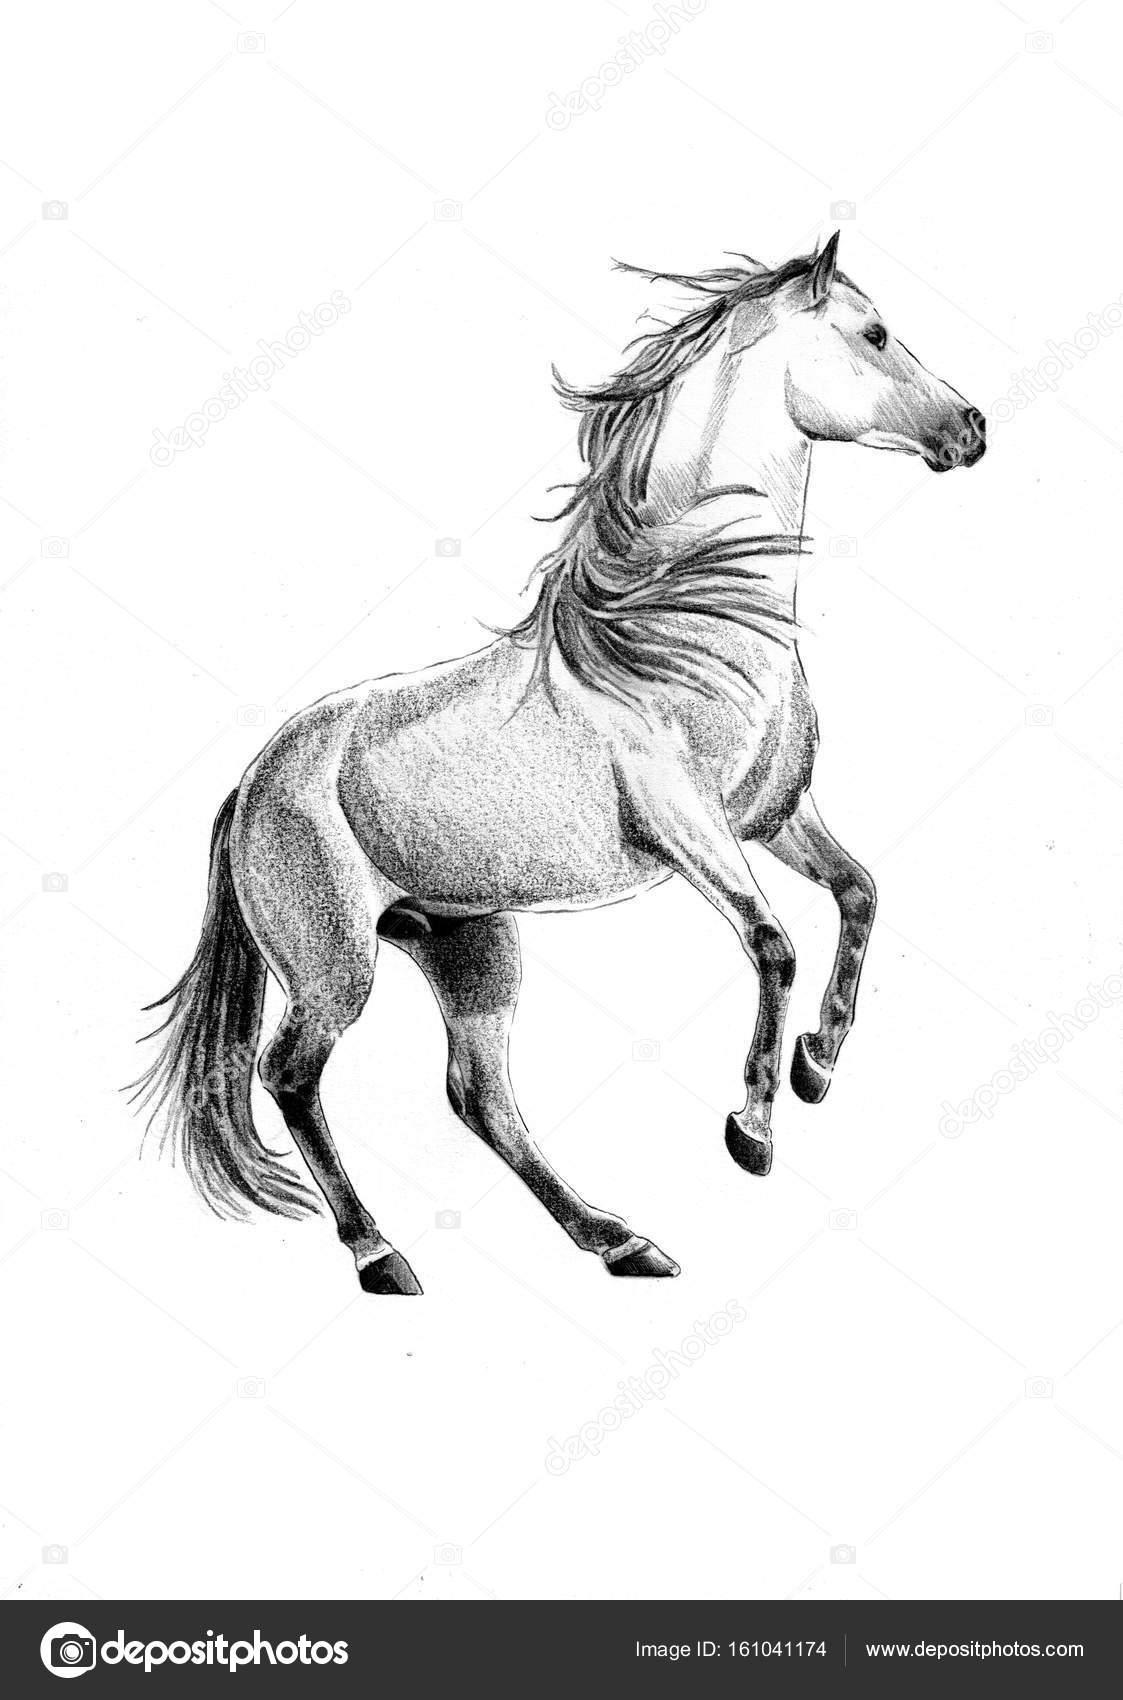 dibujo a lápiz cabeza caballo a mano alzada — Fotos de Stock ...